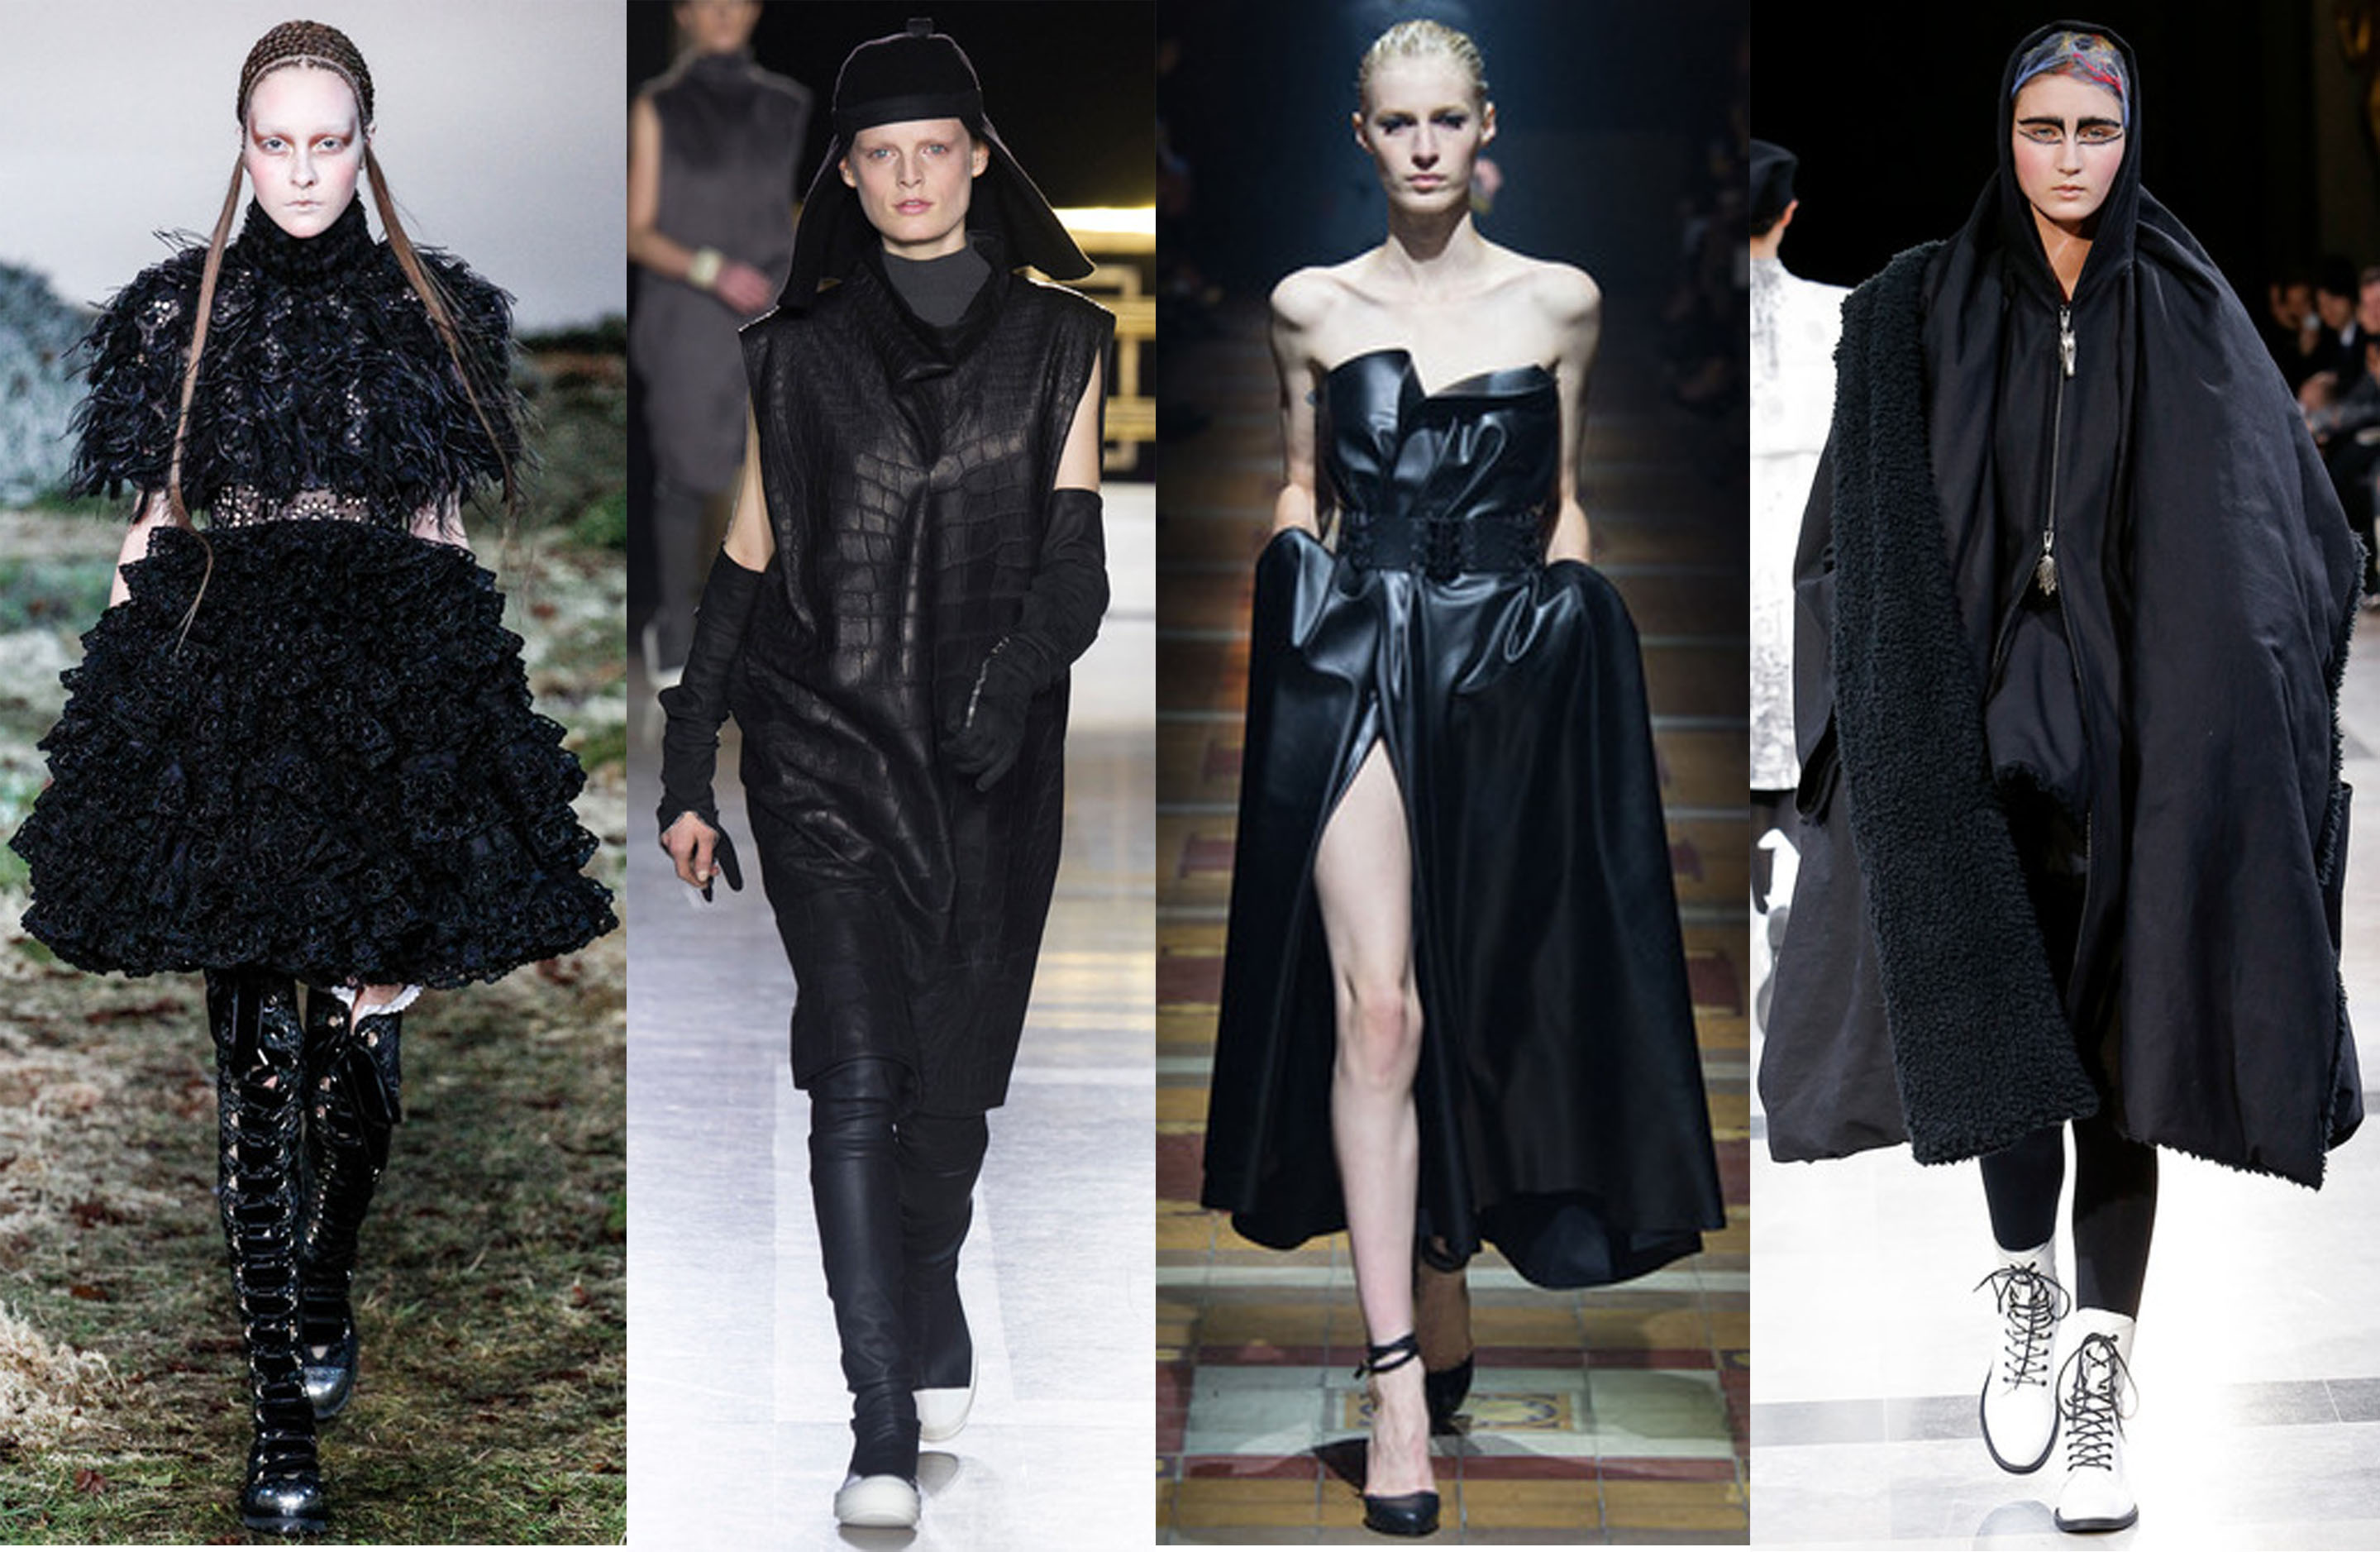 Alexander McQueen, Rick Owens, Lanvin, Yohji Yamamoto Fall 2014